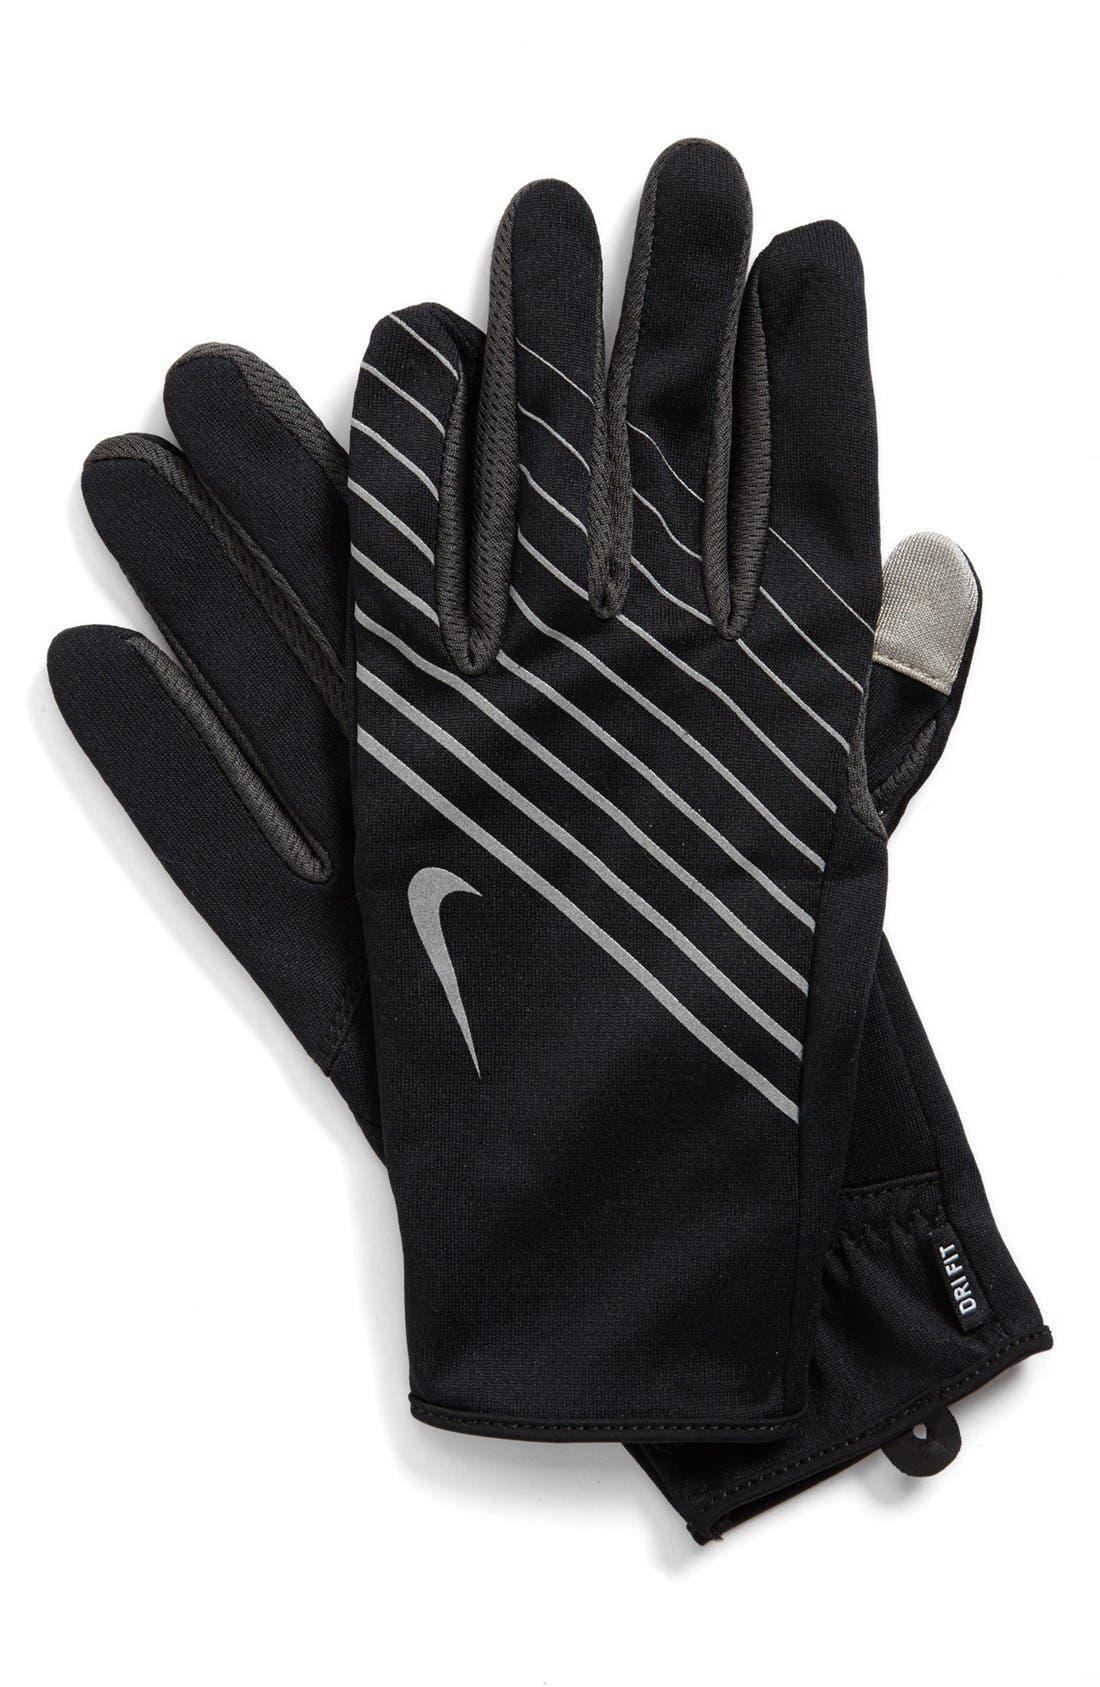 Main Image - Nike 'Tech' Dri-FIT Running Gloves